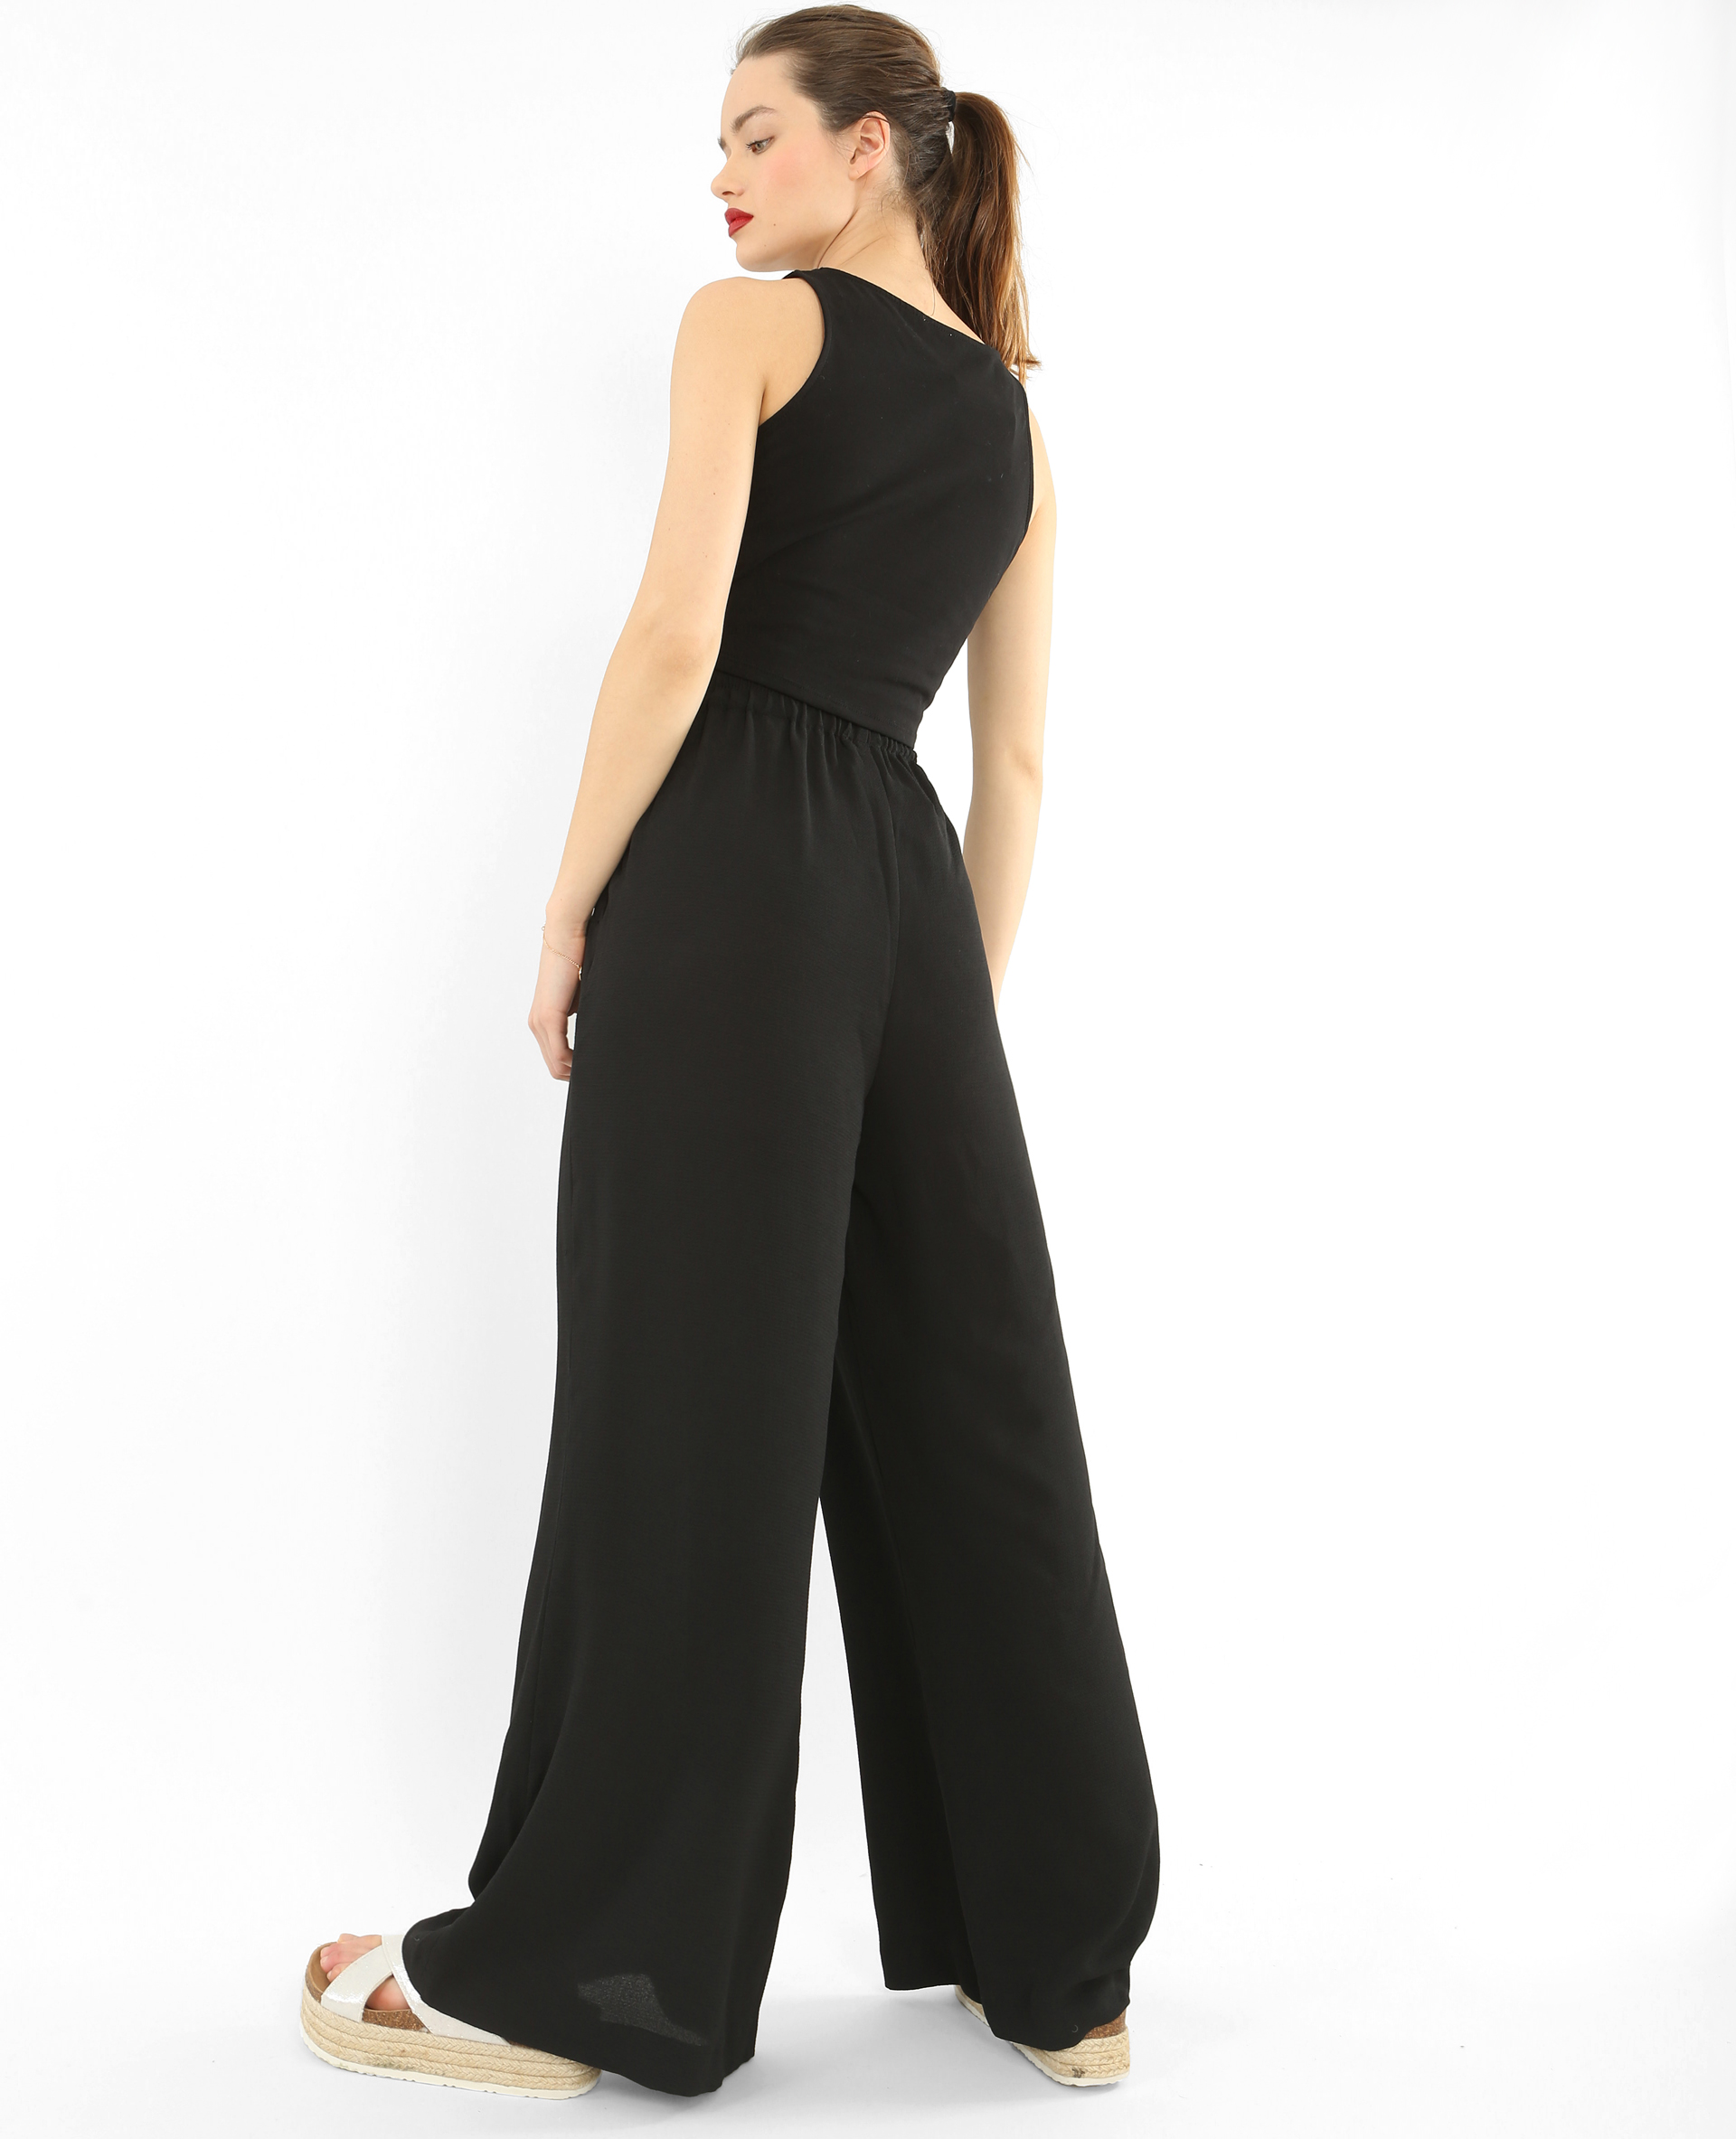 pantalon large effet cr pe noir 140272899a08 pimkie. Black Bedroom Furniture Sets. Home Design Ideas